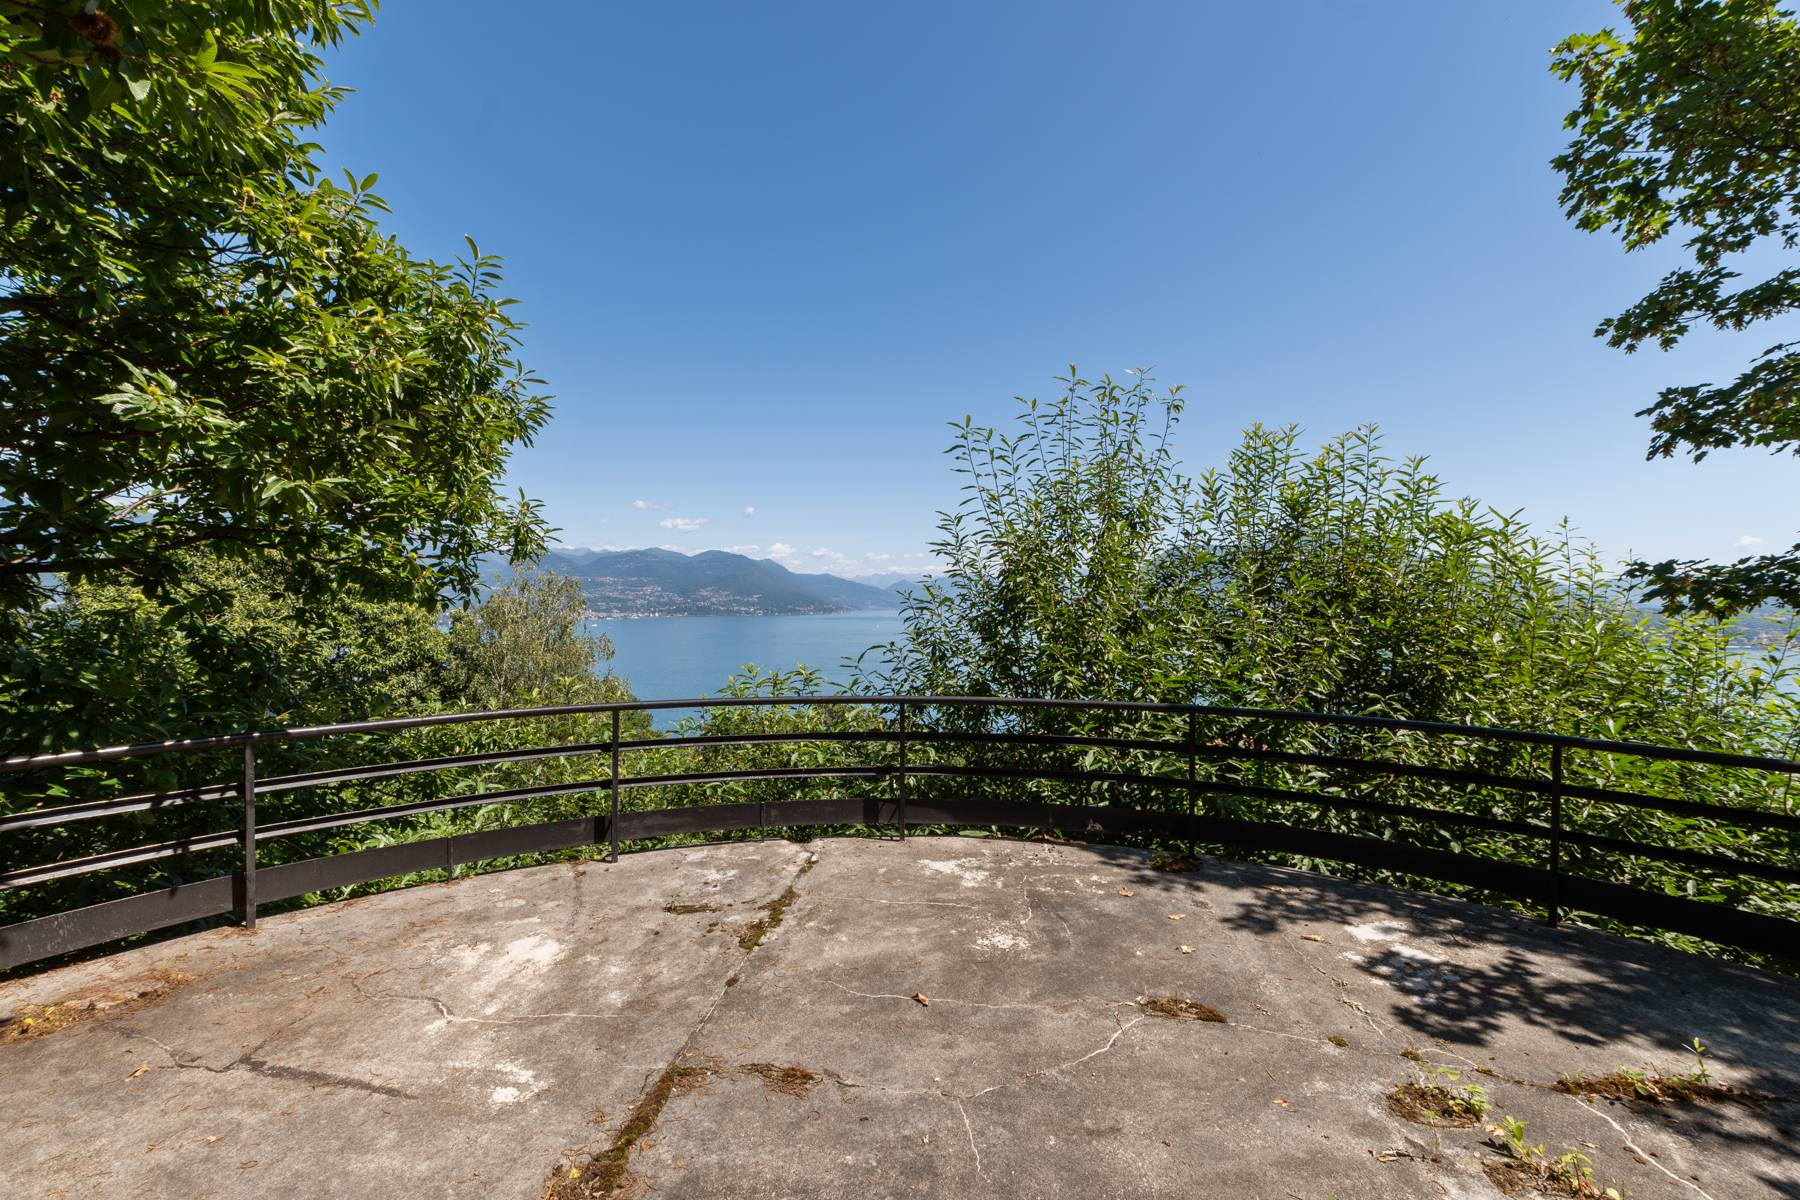 Villa in Vendita a Stresa: 5 locali, 150 mq